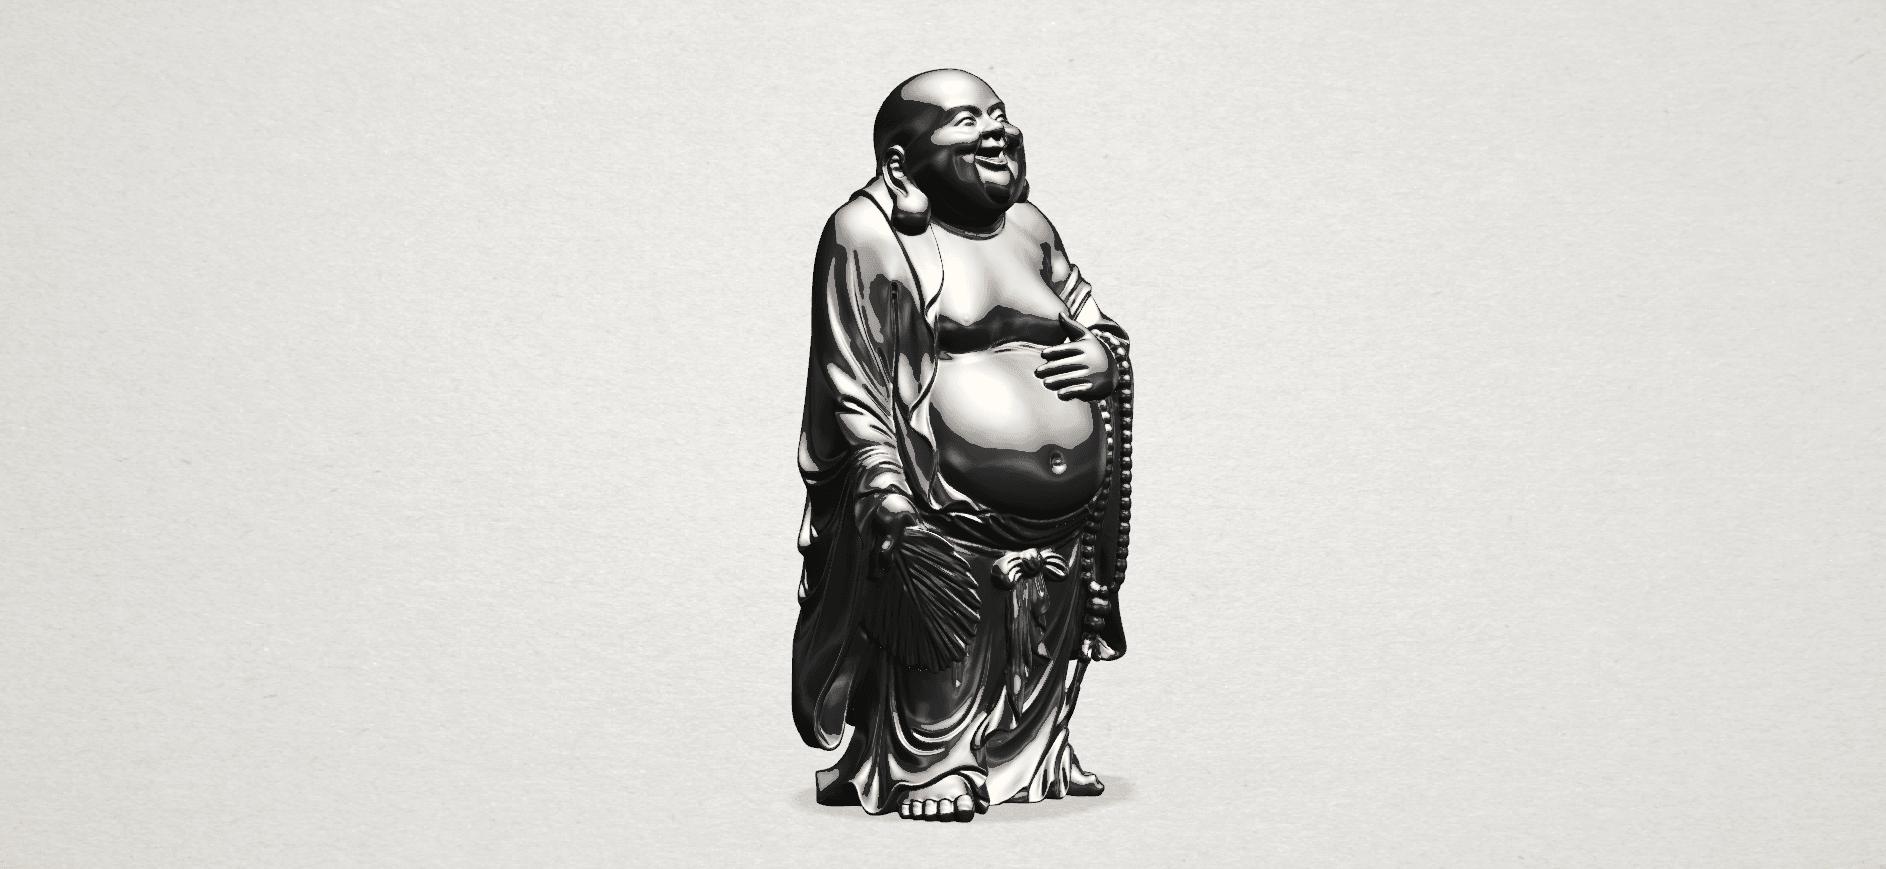 TDA0070 Metteyya Buddha 01 - 88mm - B06.png Download free STL file Metteyya Buddha 01 • 3D print object, GeorgesNikkei